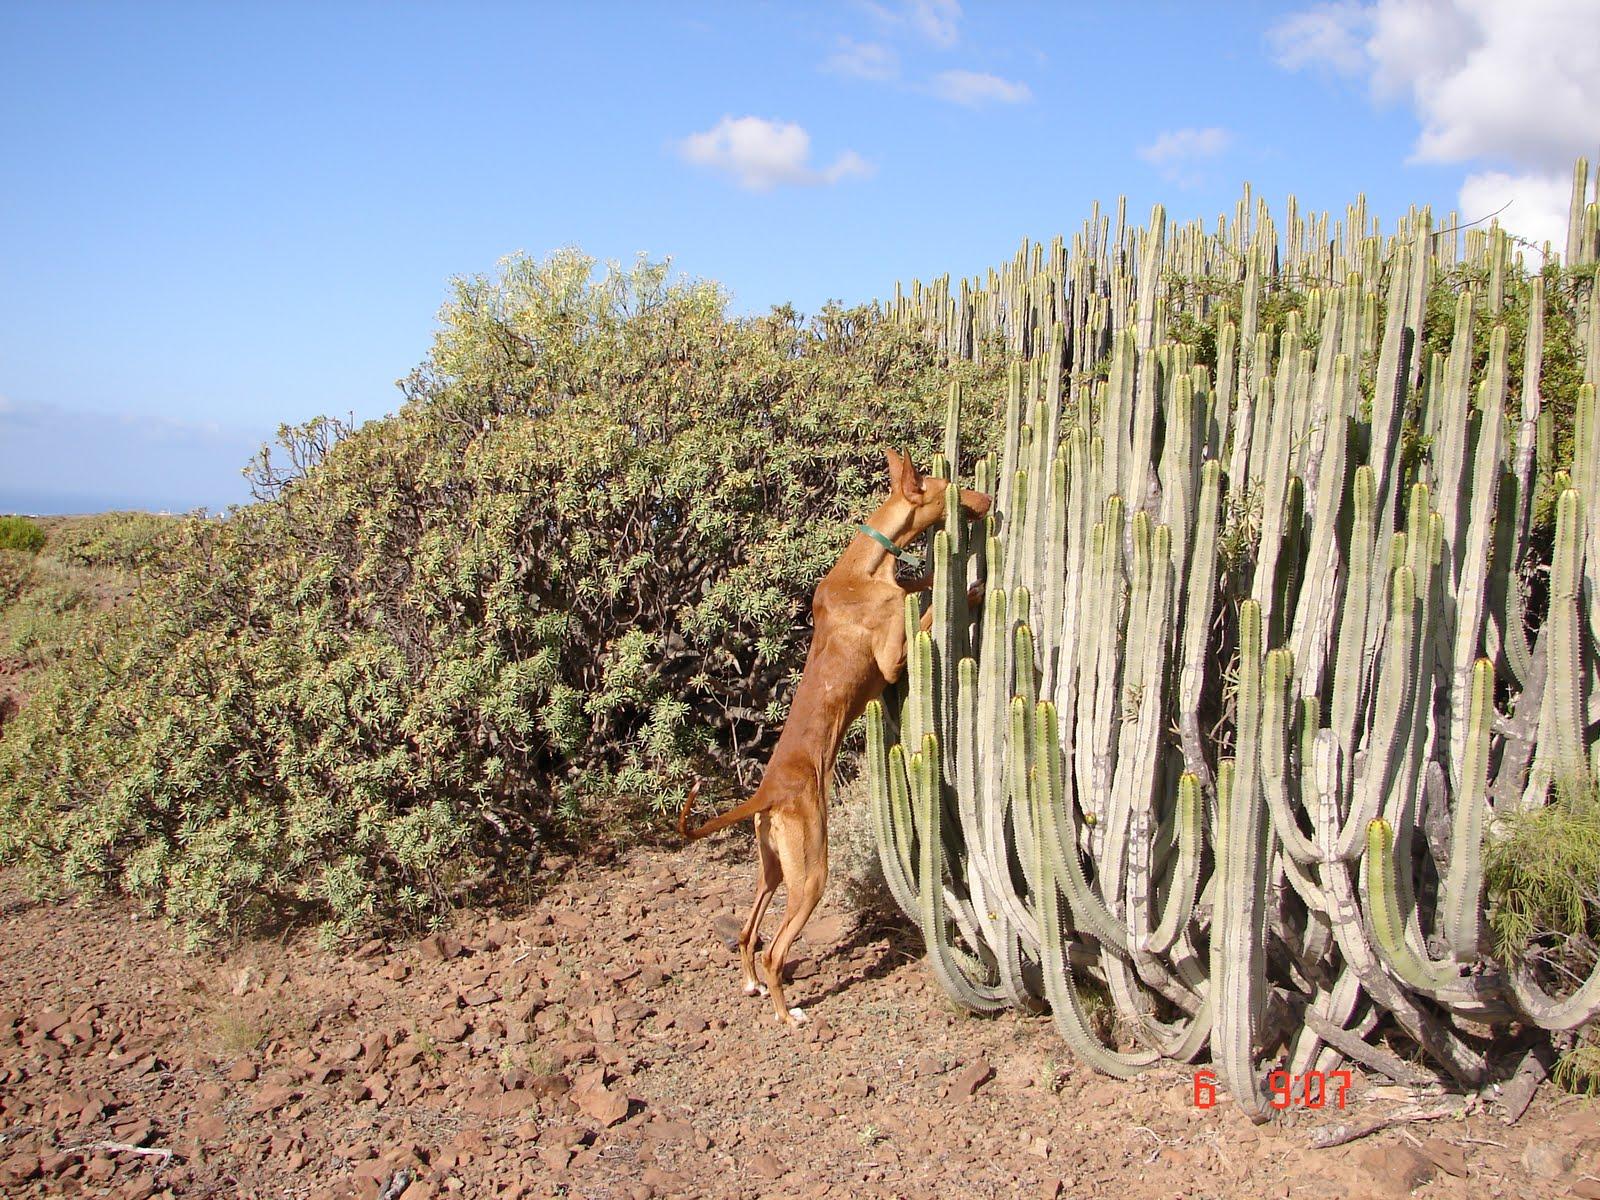 Podenco Canario dog in cacti wallpaper